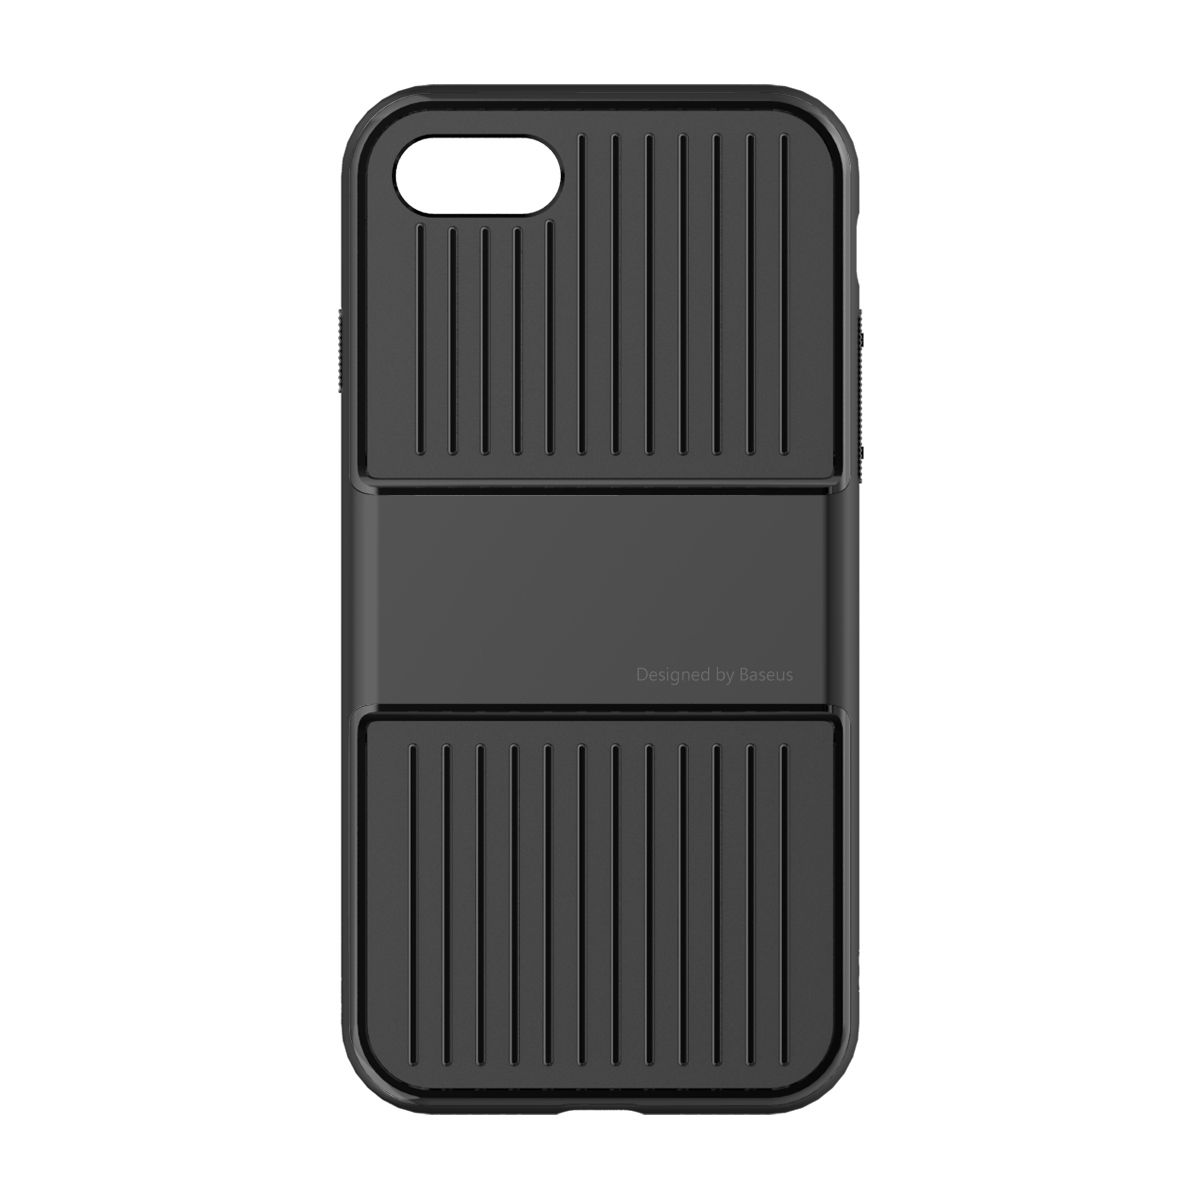 Capa Protetora Baseus Travel para iPhone 7/8 e 7/8 Plus